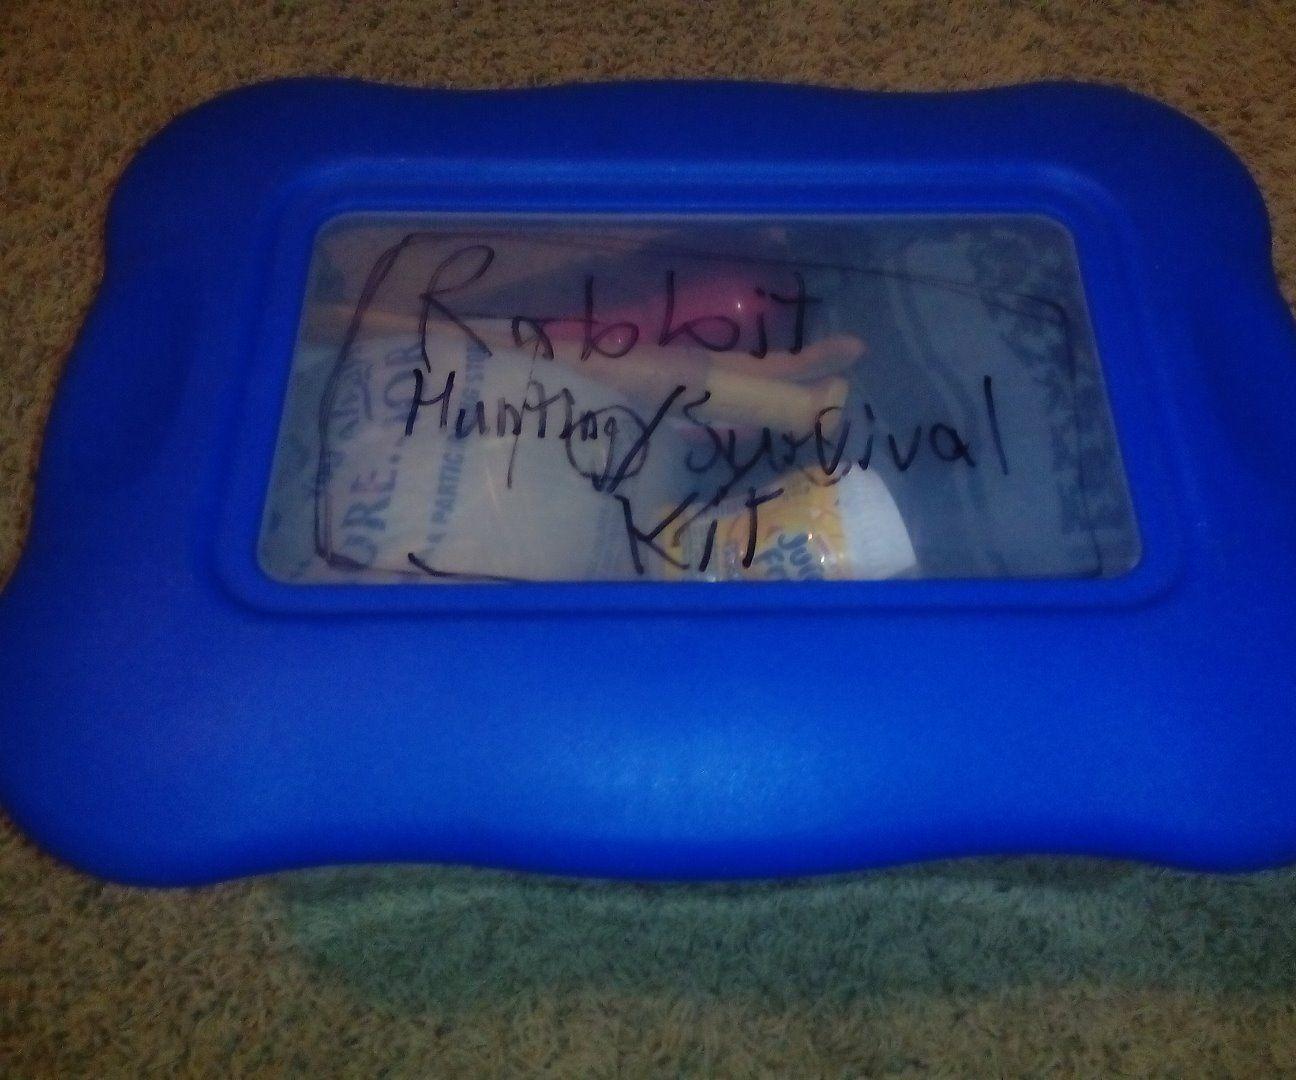 Rabbit hunting+cooking/survival kit